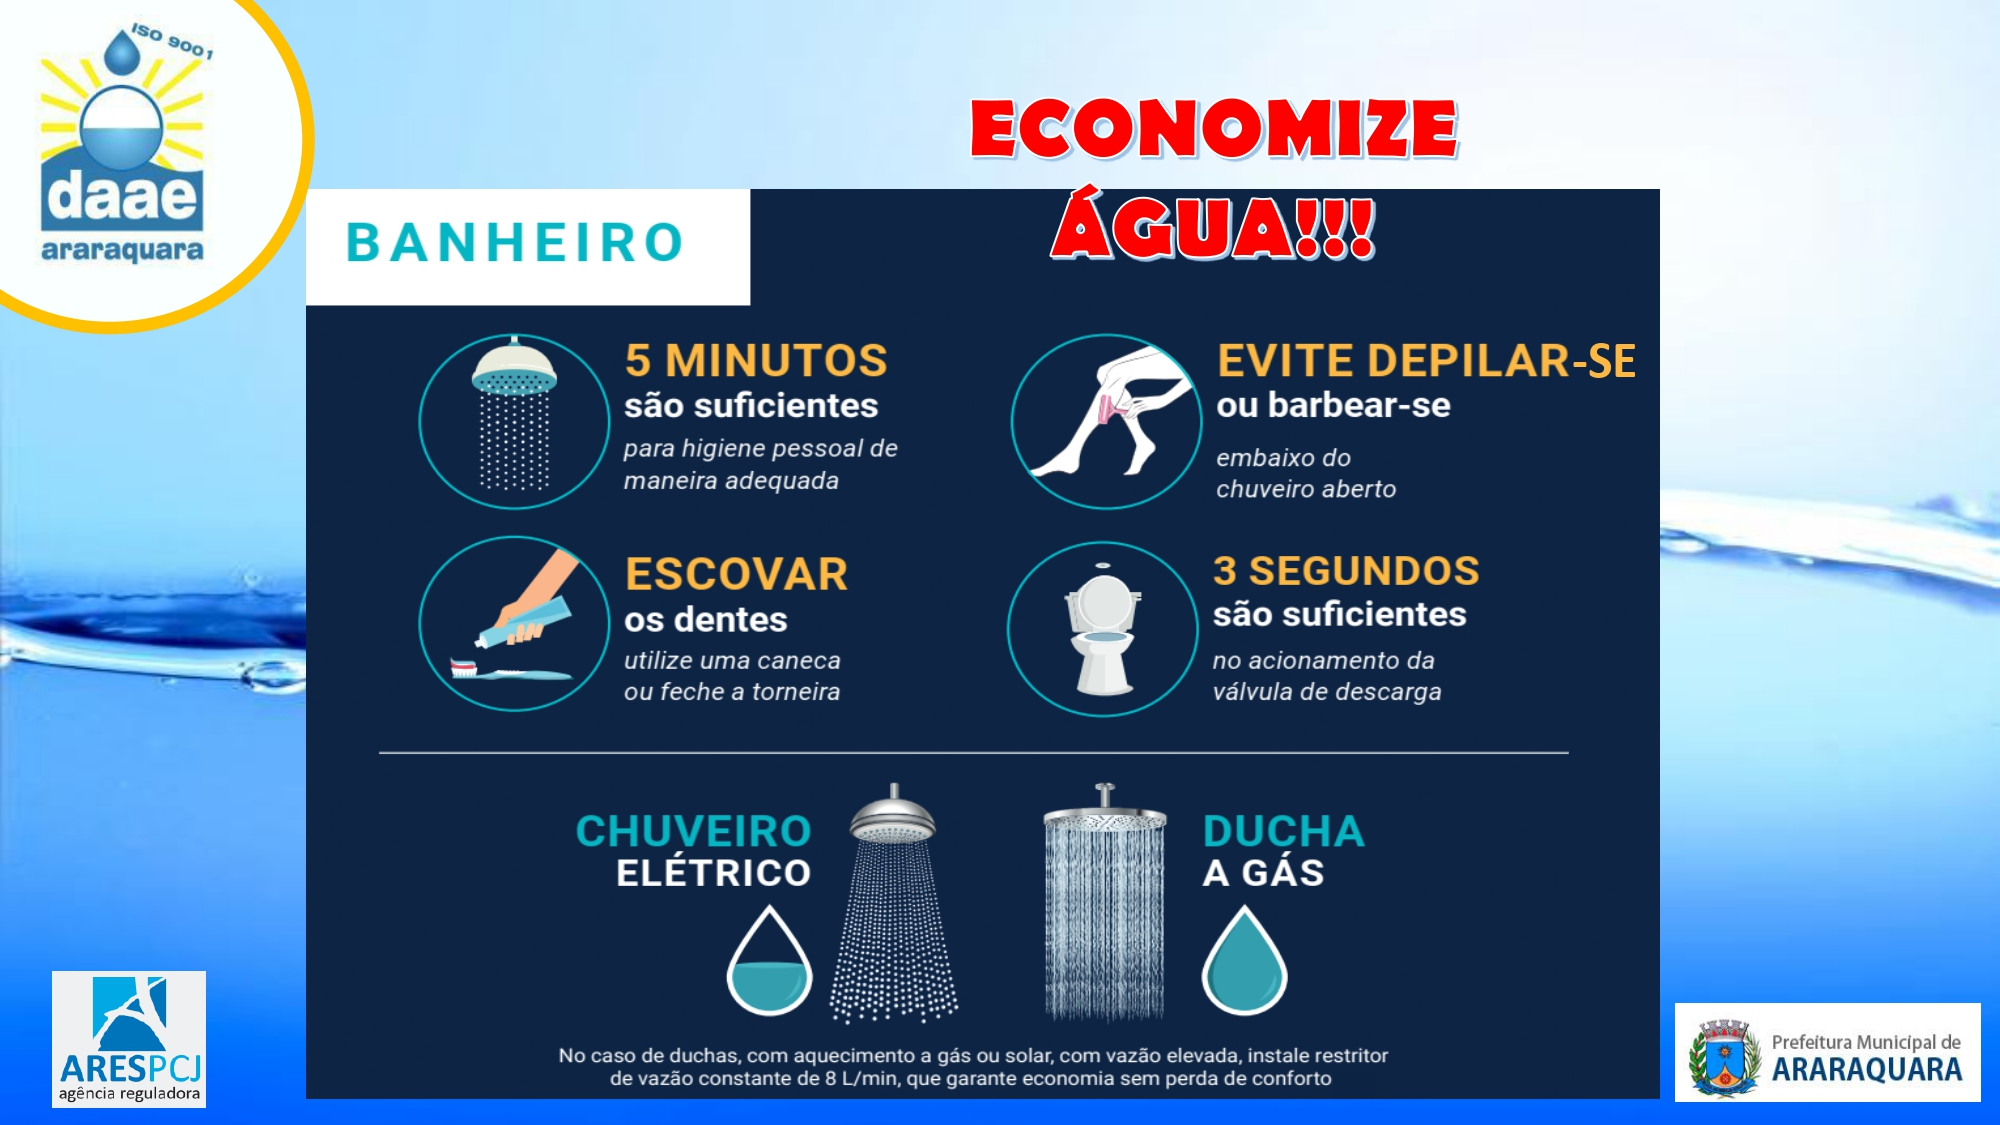 Daae alerta para o uso racional da água